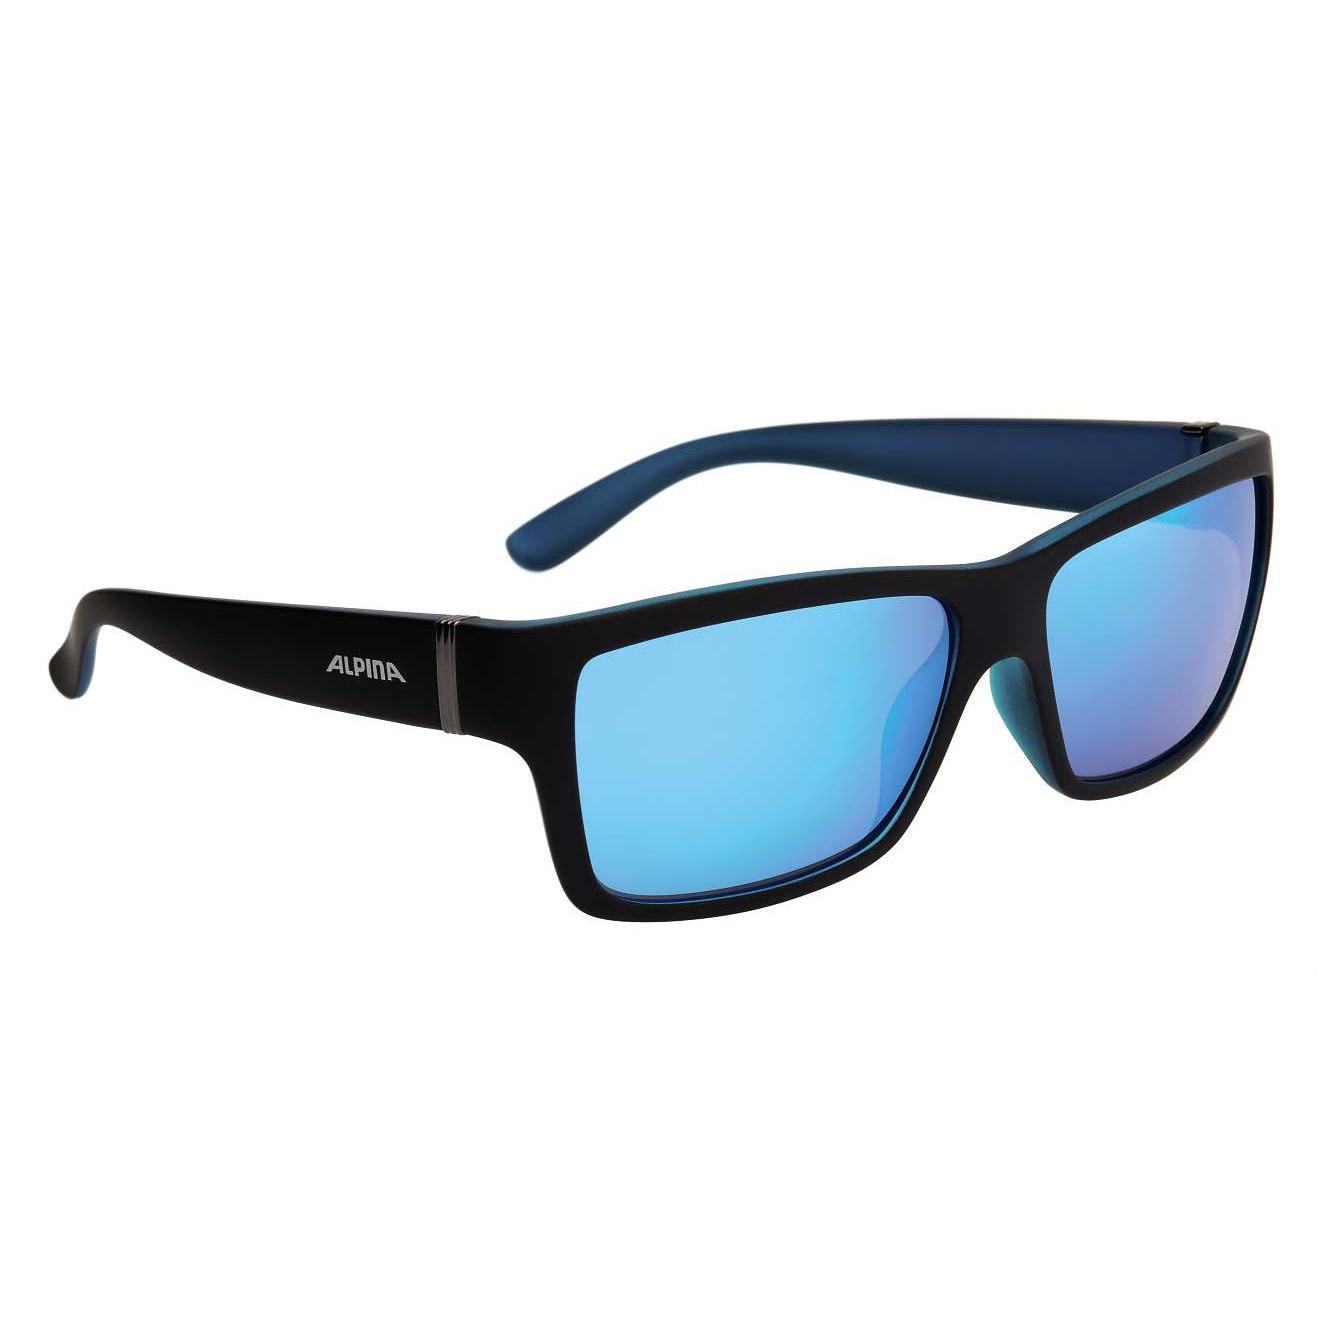 Alpina Kacey Glasses - Black Matt-Blue/CeramiC Mirror Blue